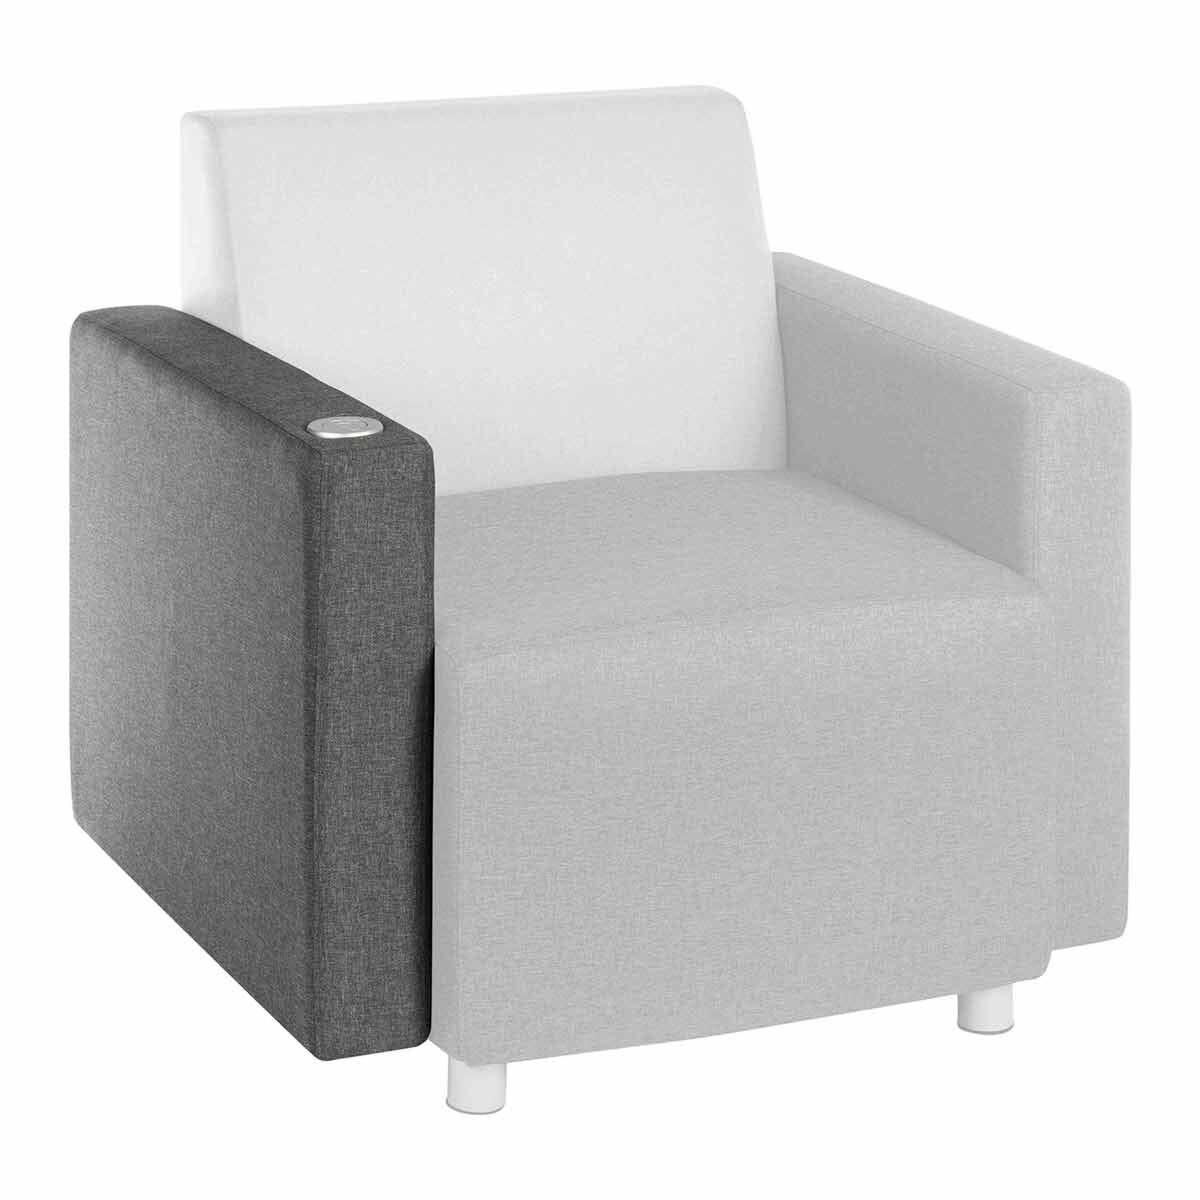 Teknik Office Cube Modular Reception Chair USB Arm Right